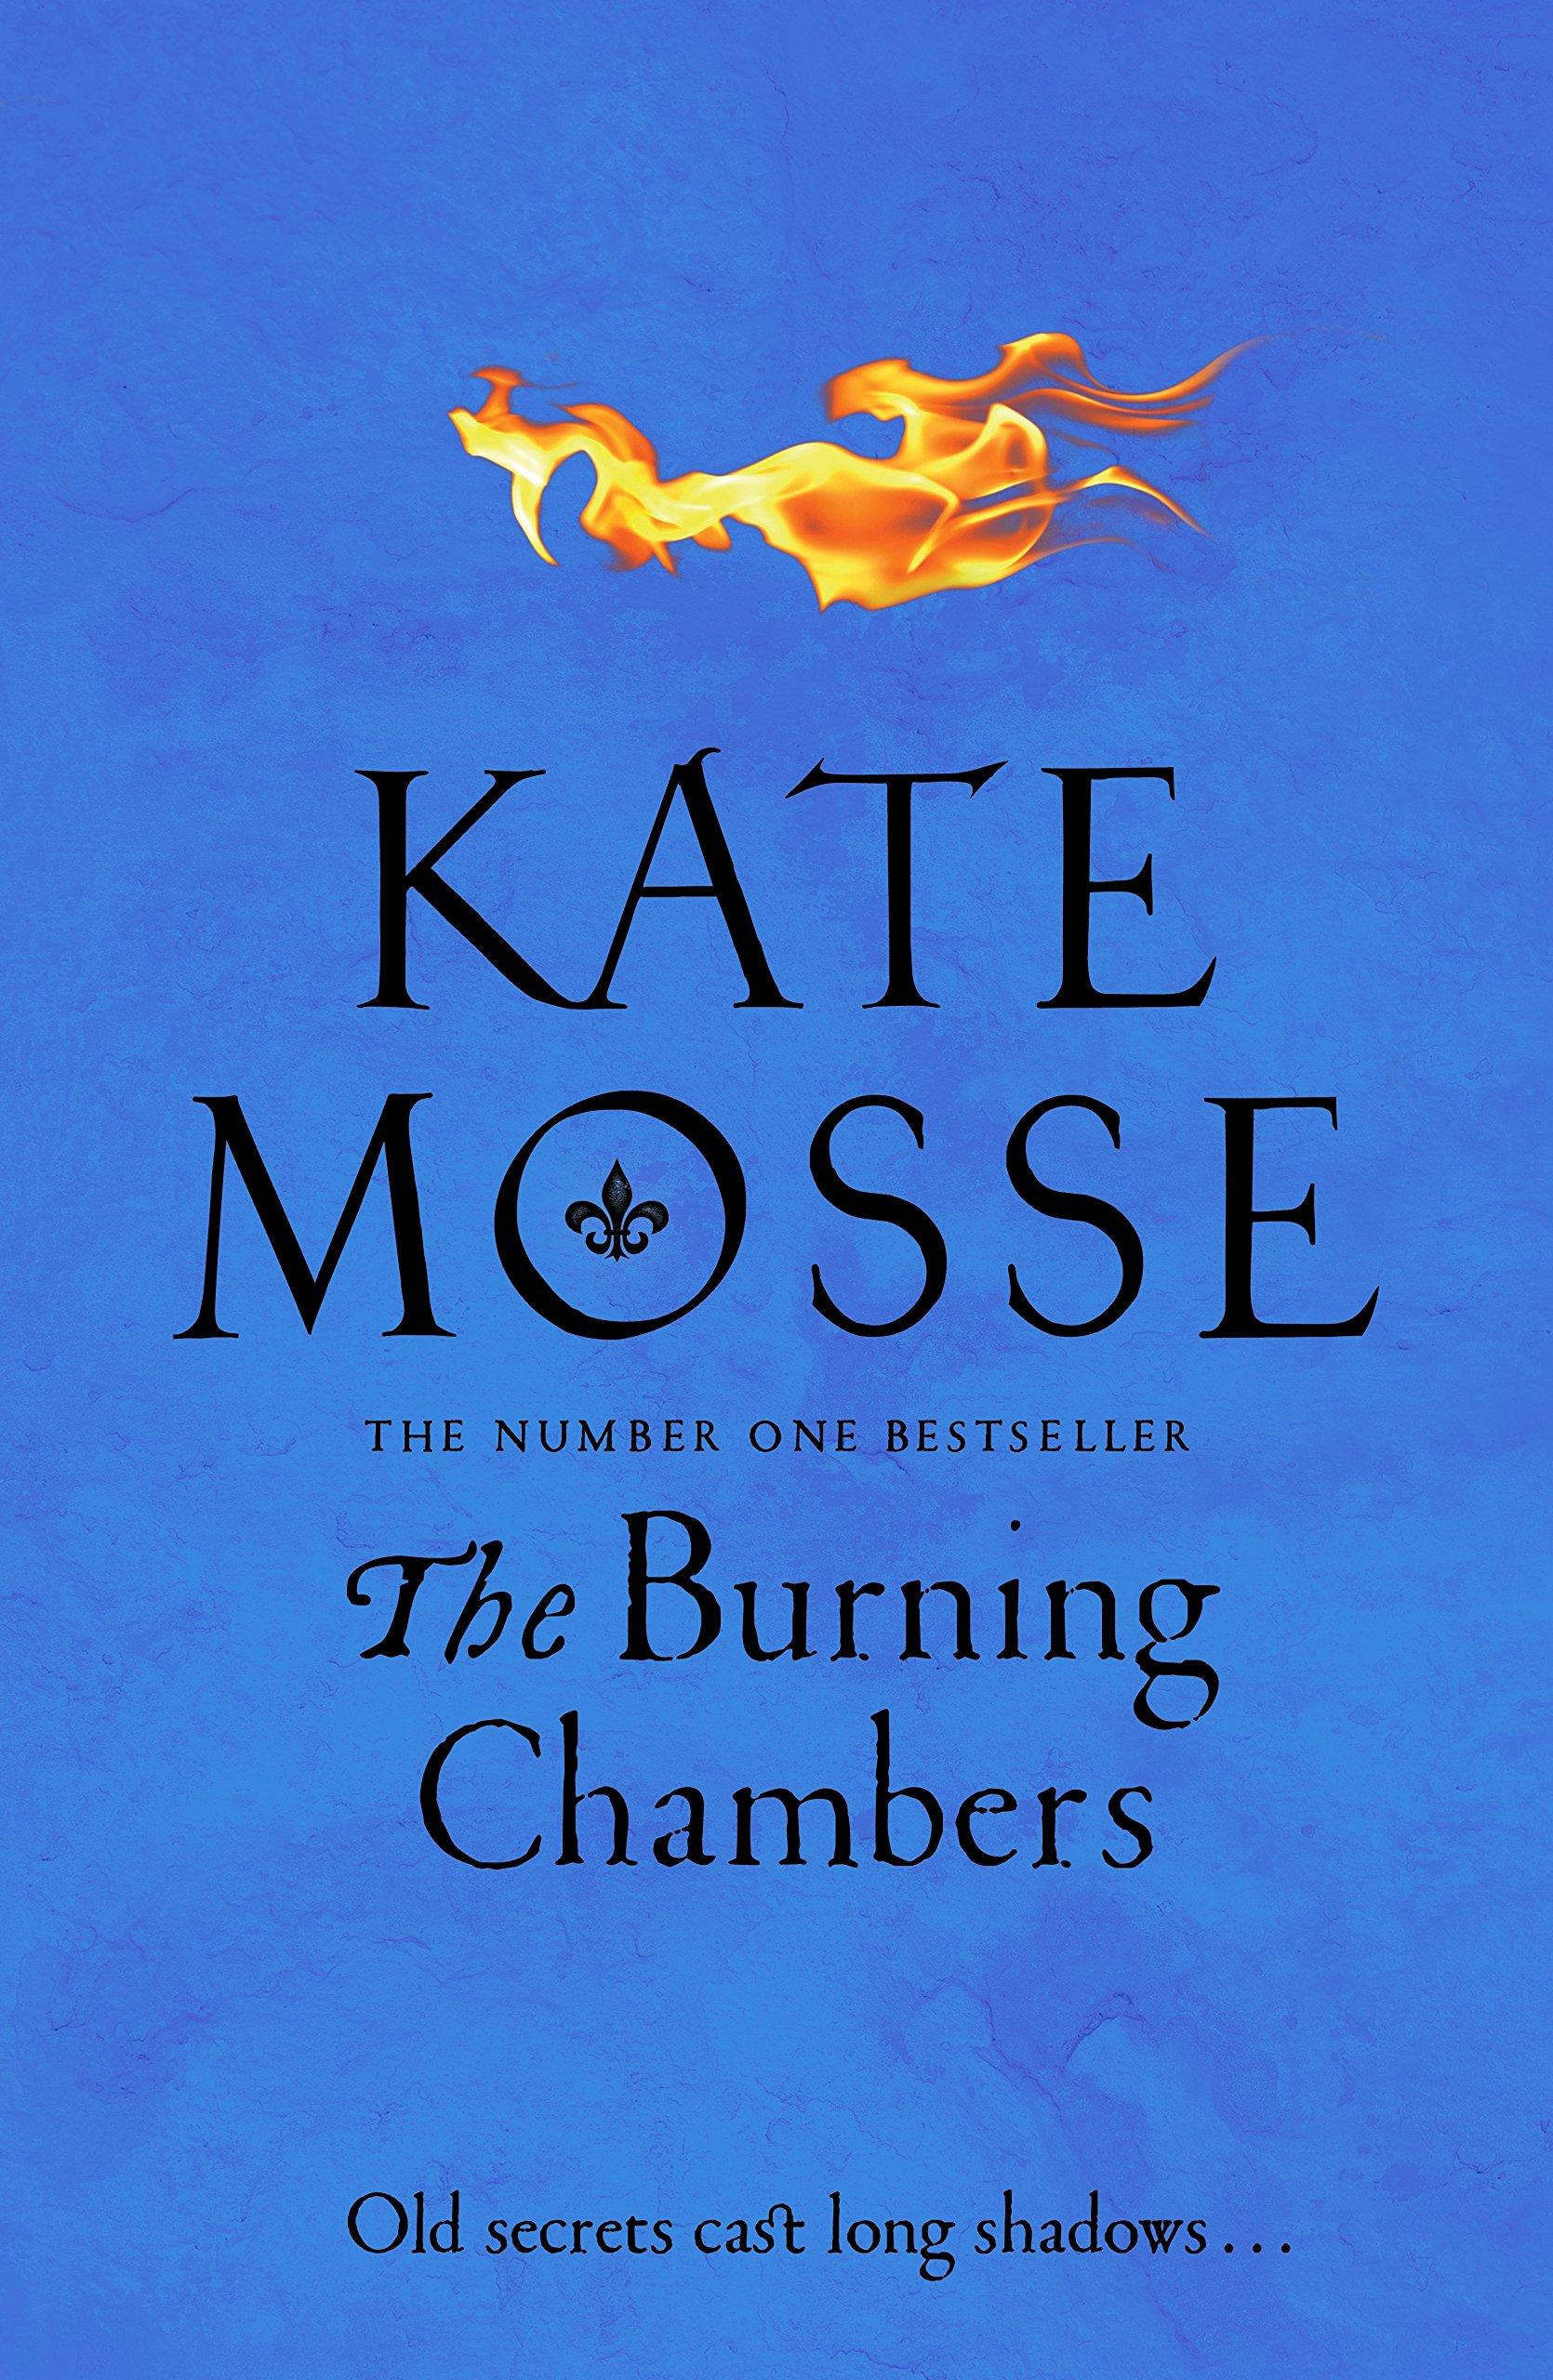 Mosse, K: Burning Chambers (The Burning Chambers): Amazon.es: Mosse, Kate: Libros en idiomas extranjeros